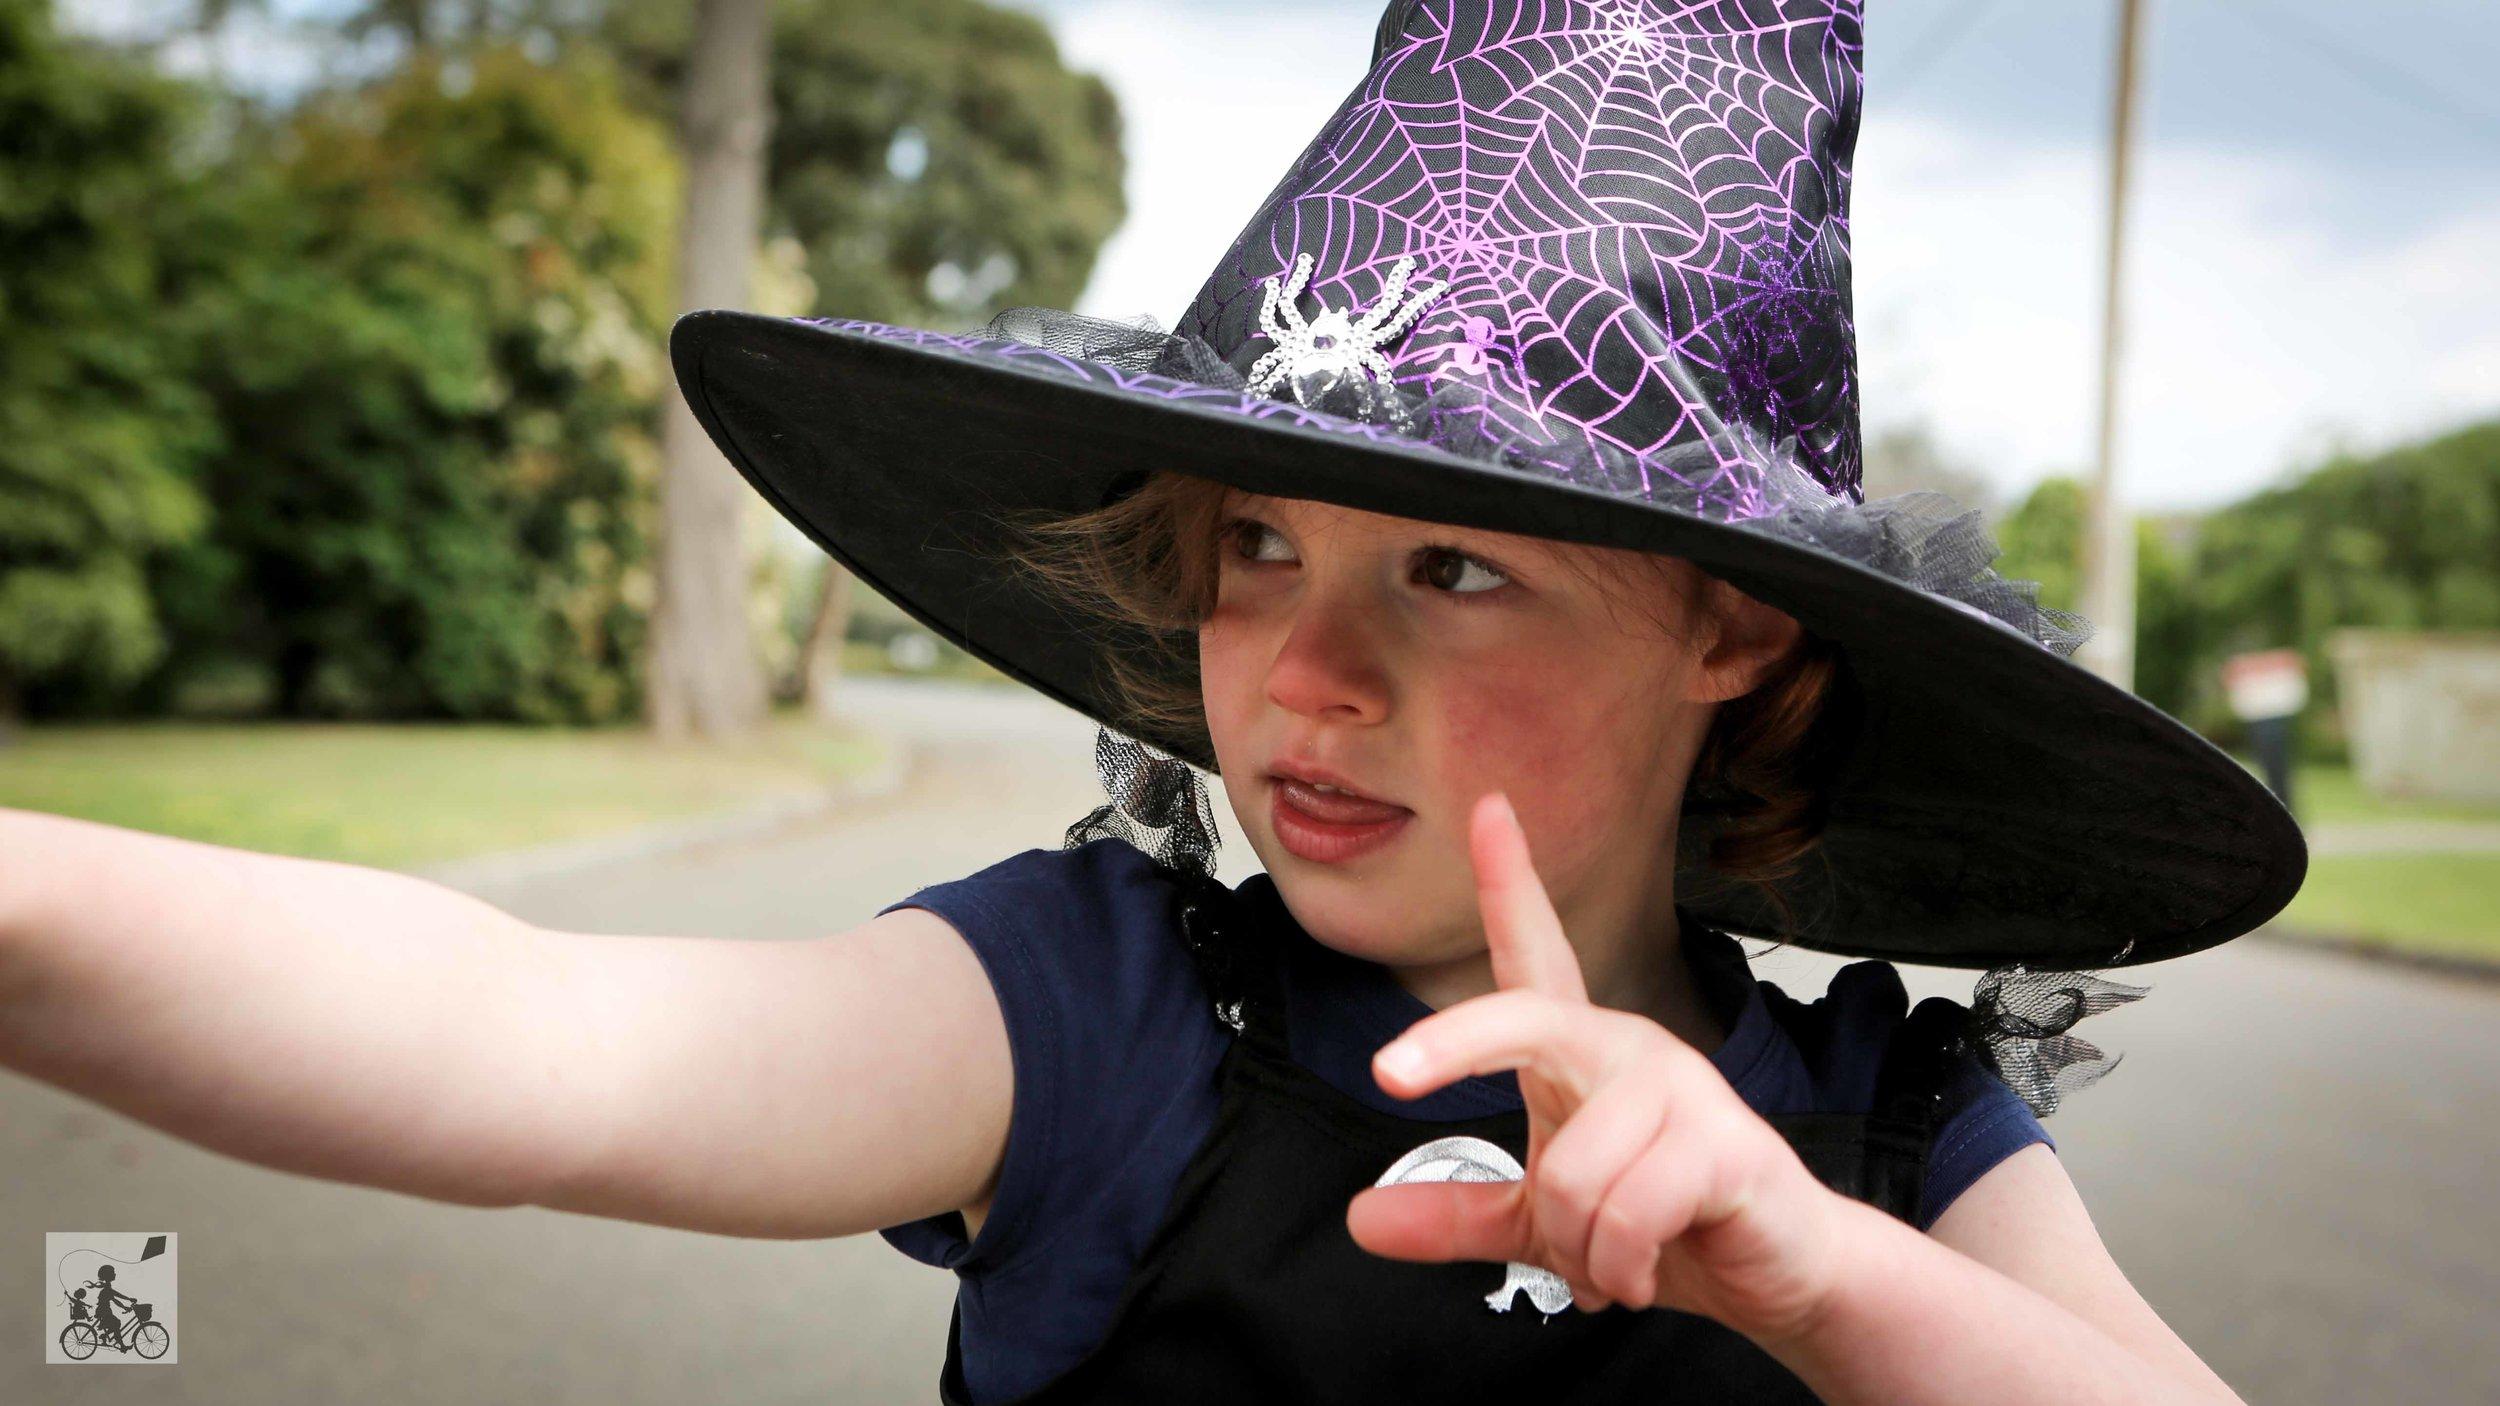 Halloween INSIDE October 2018 - Mamma Knows East (1 of 1).jpg